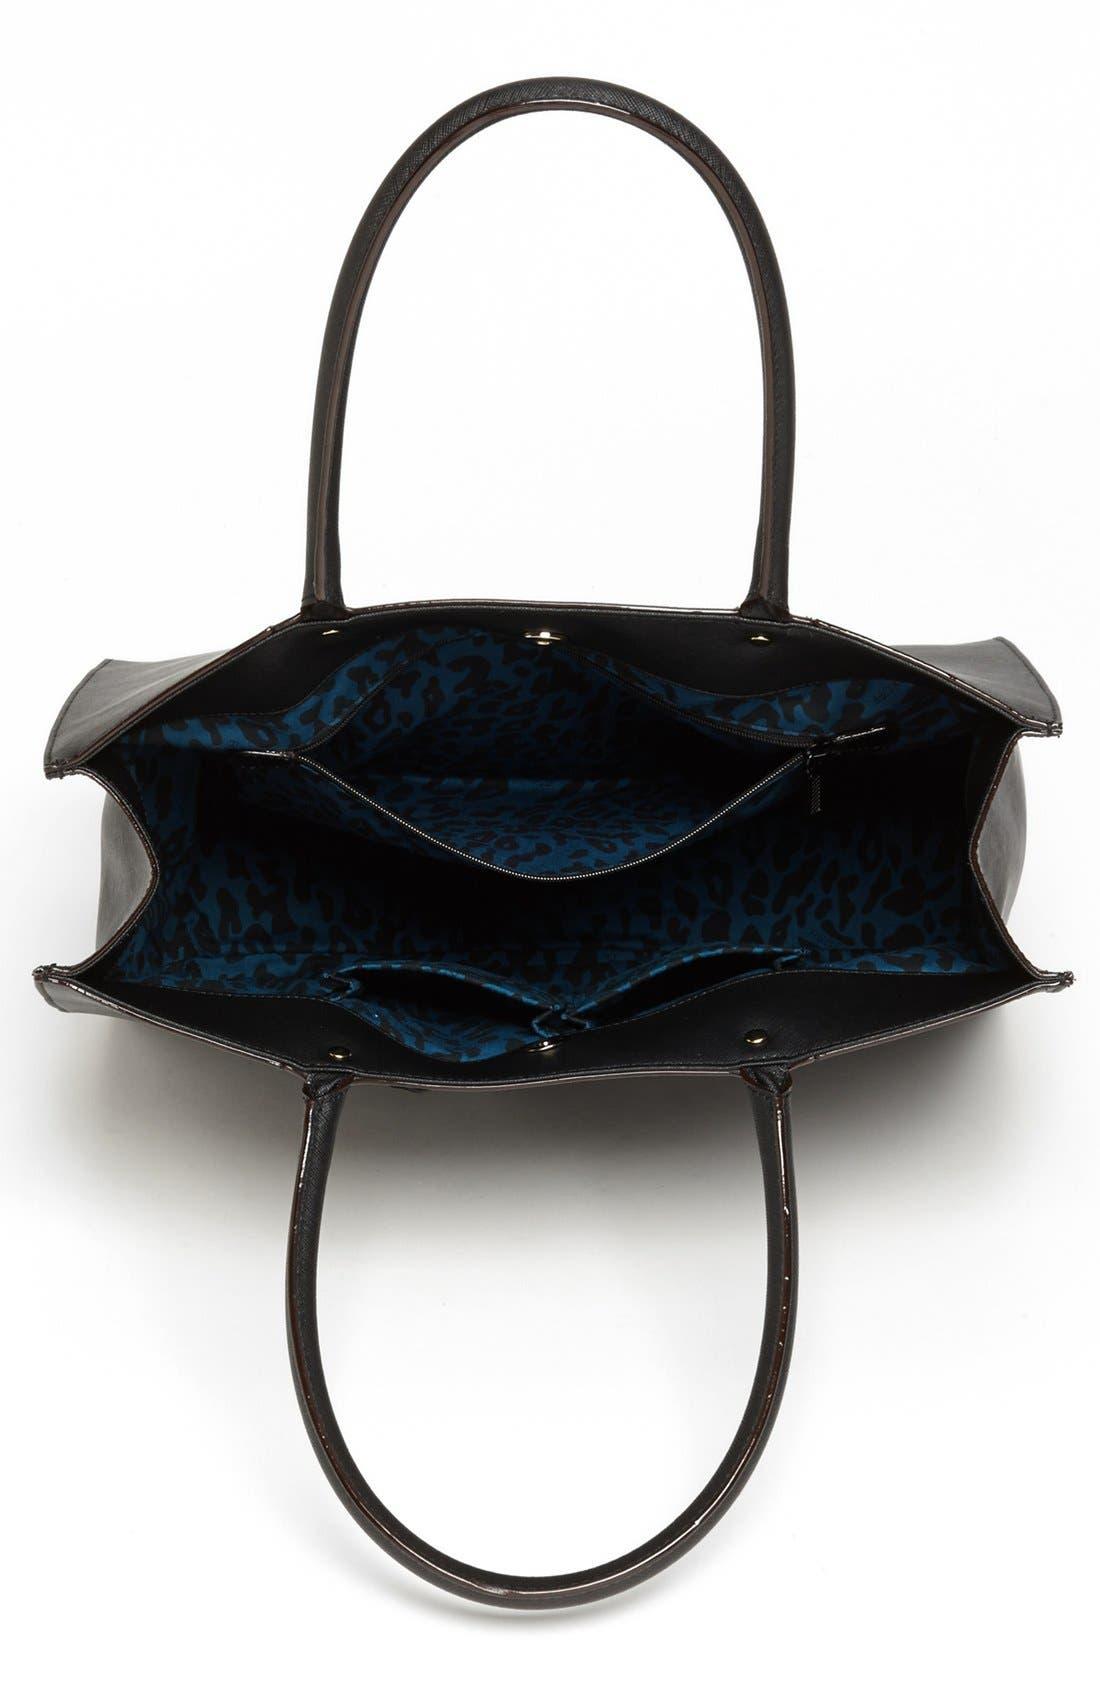 REBECCA MINKOFF, 'Medium MAB' Saffiano Leather Tote, Alternate thumbnail 4, color, 001